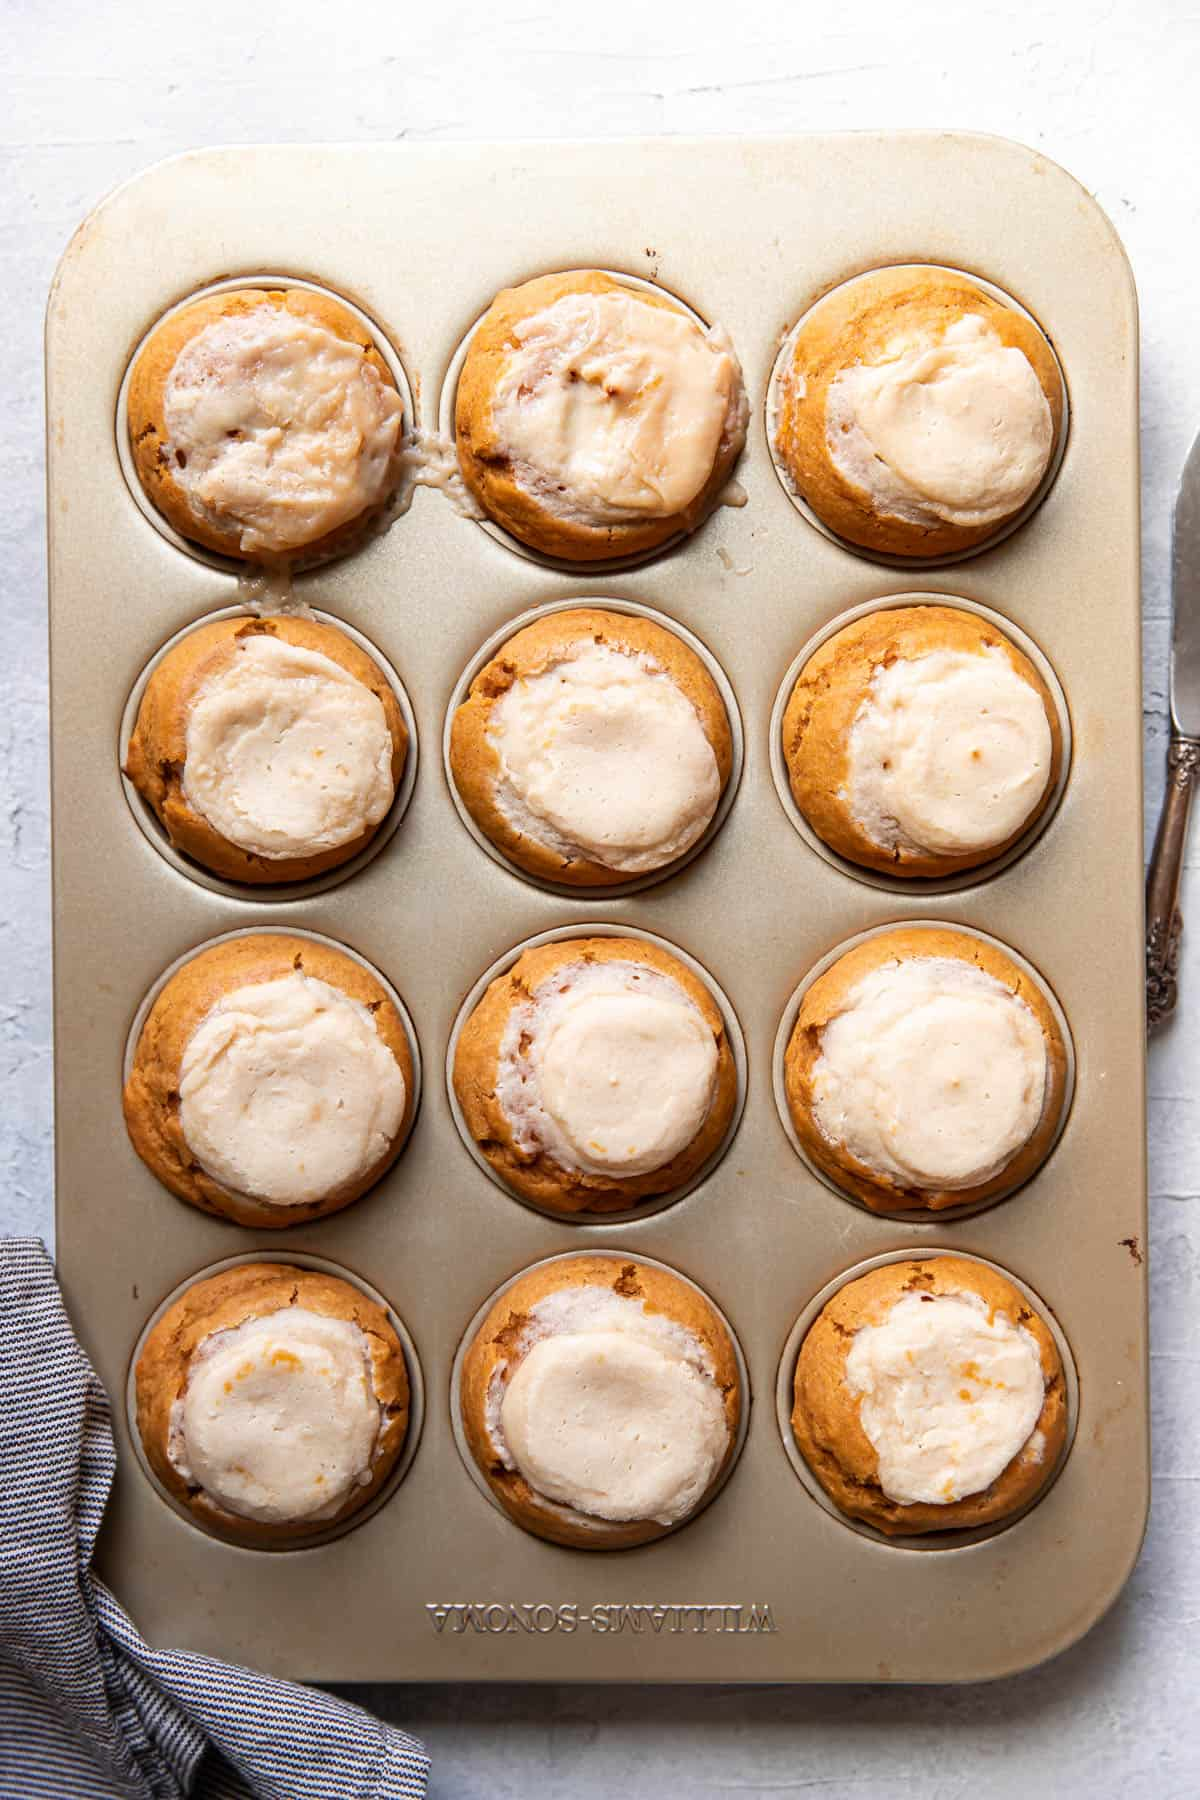 pumpkin cream cheese muffins after baking.